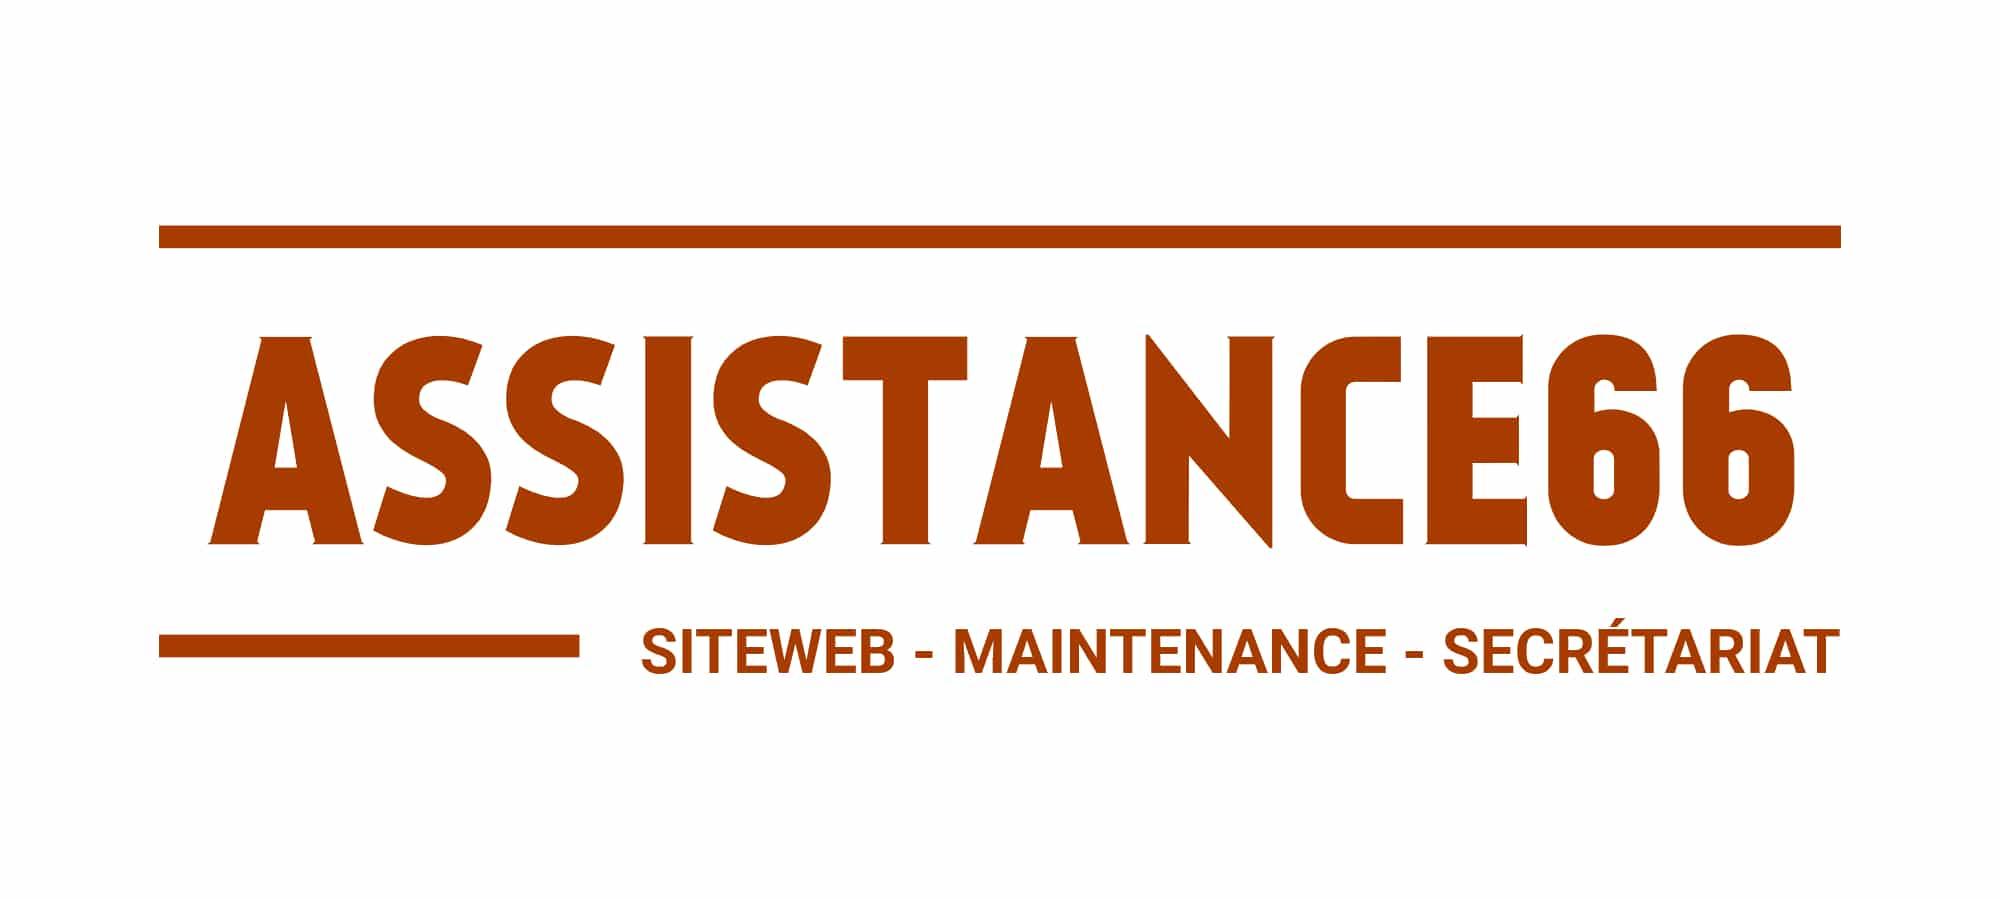 Logo Assistance66